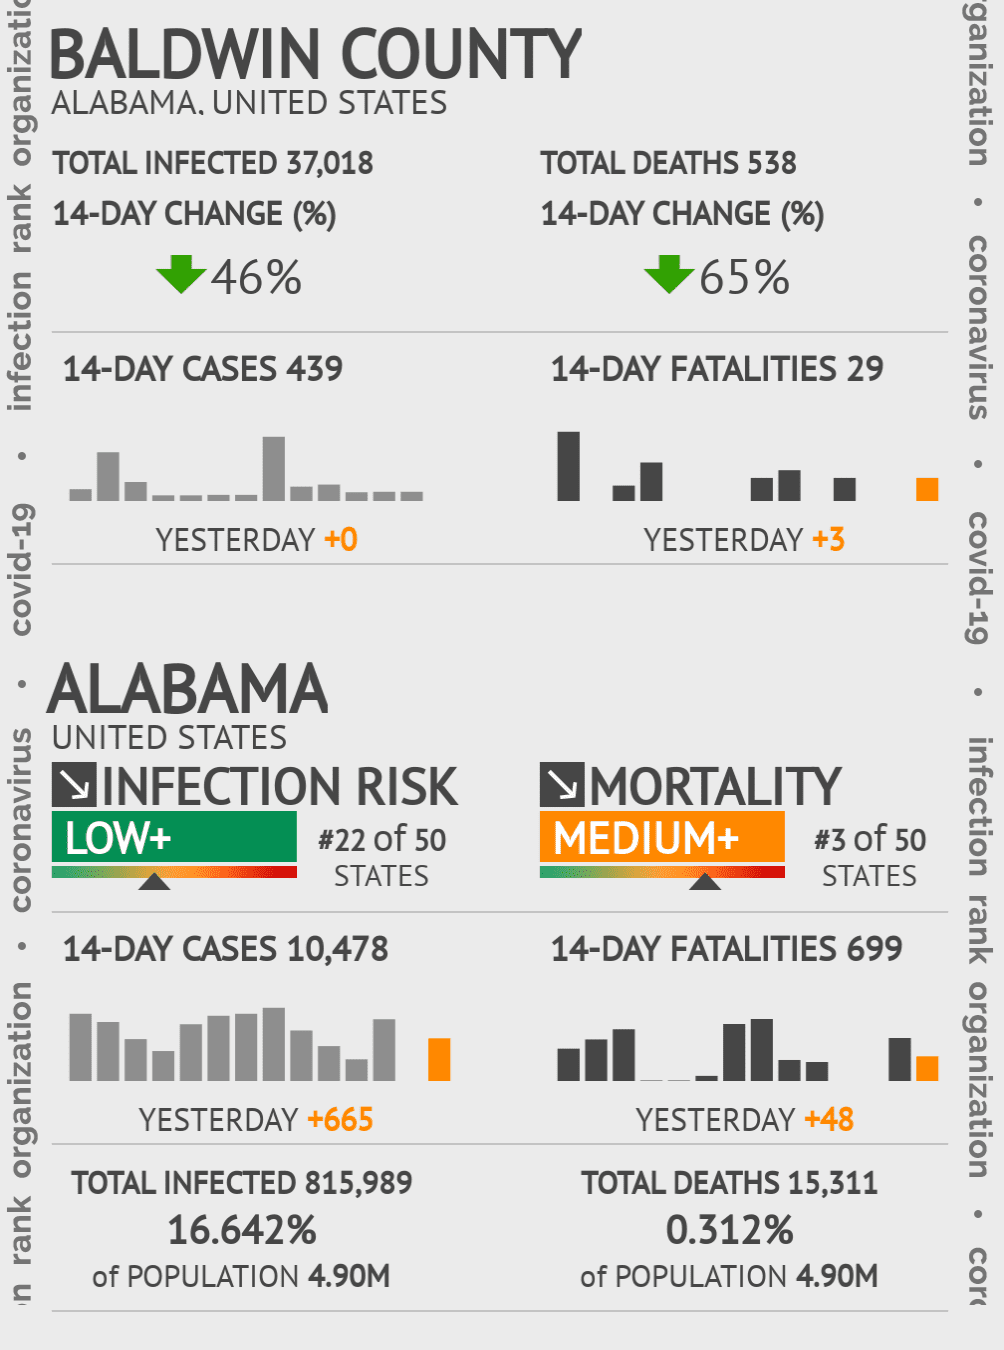 Baldwin County Coronavirus Covid-19 Risk of Infection on March 23, 2021